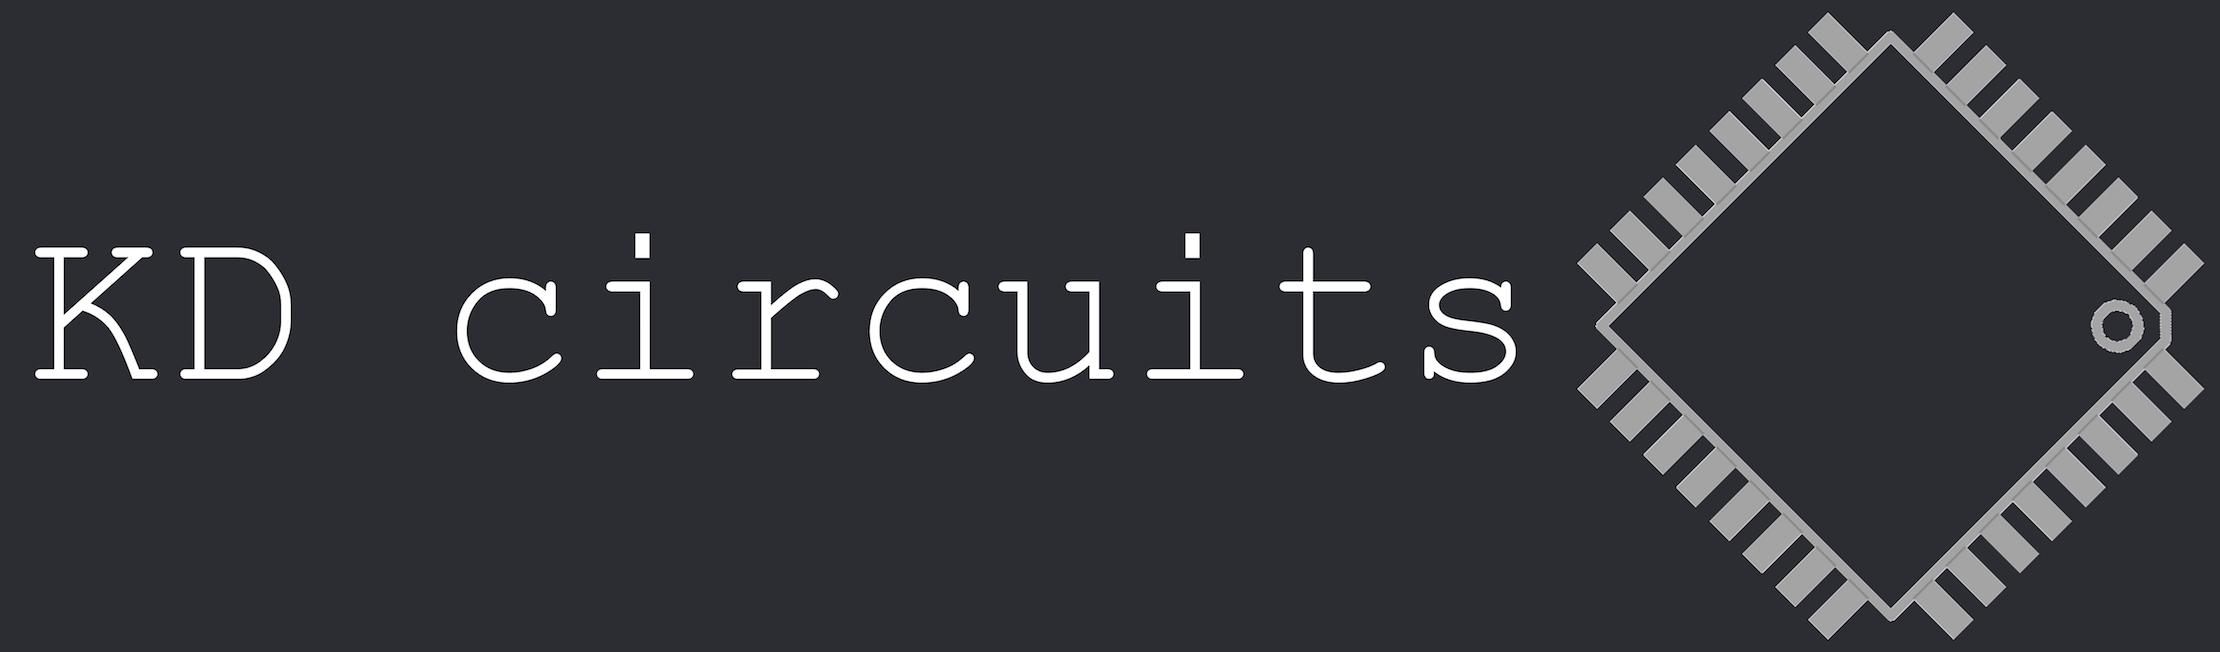 KD circuits LLC